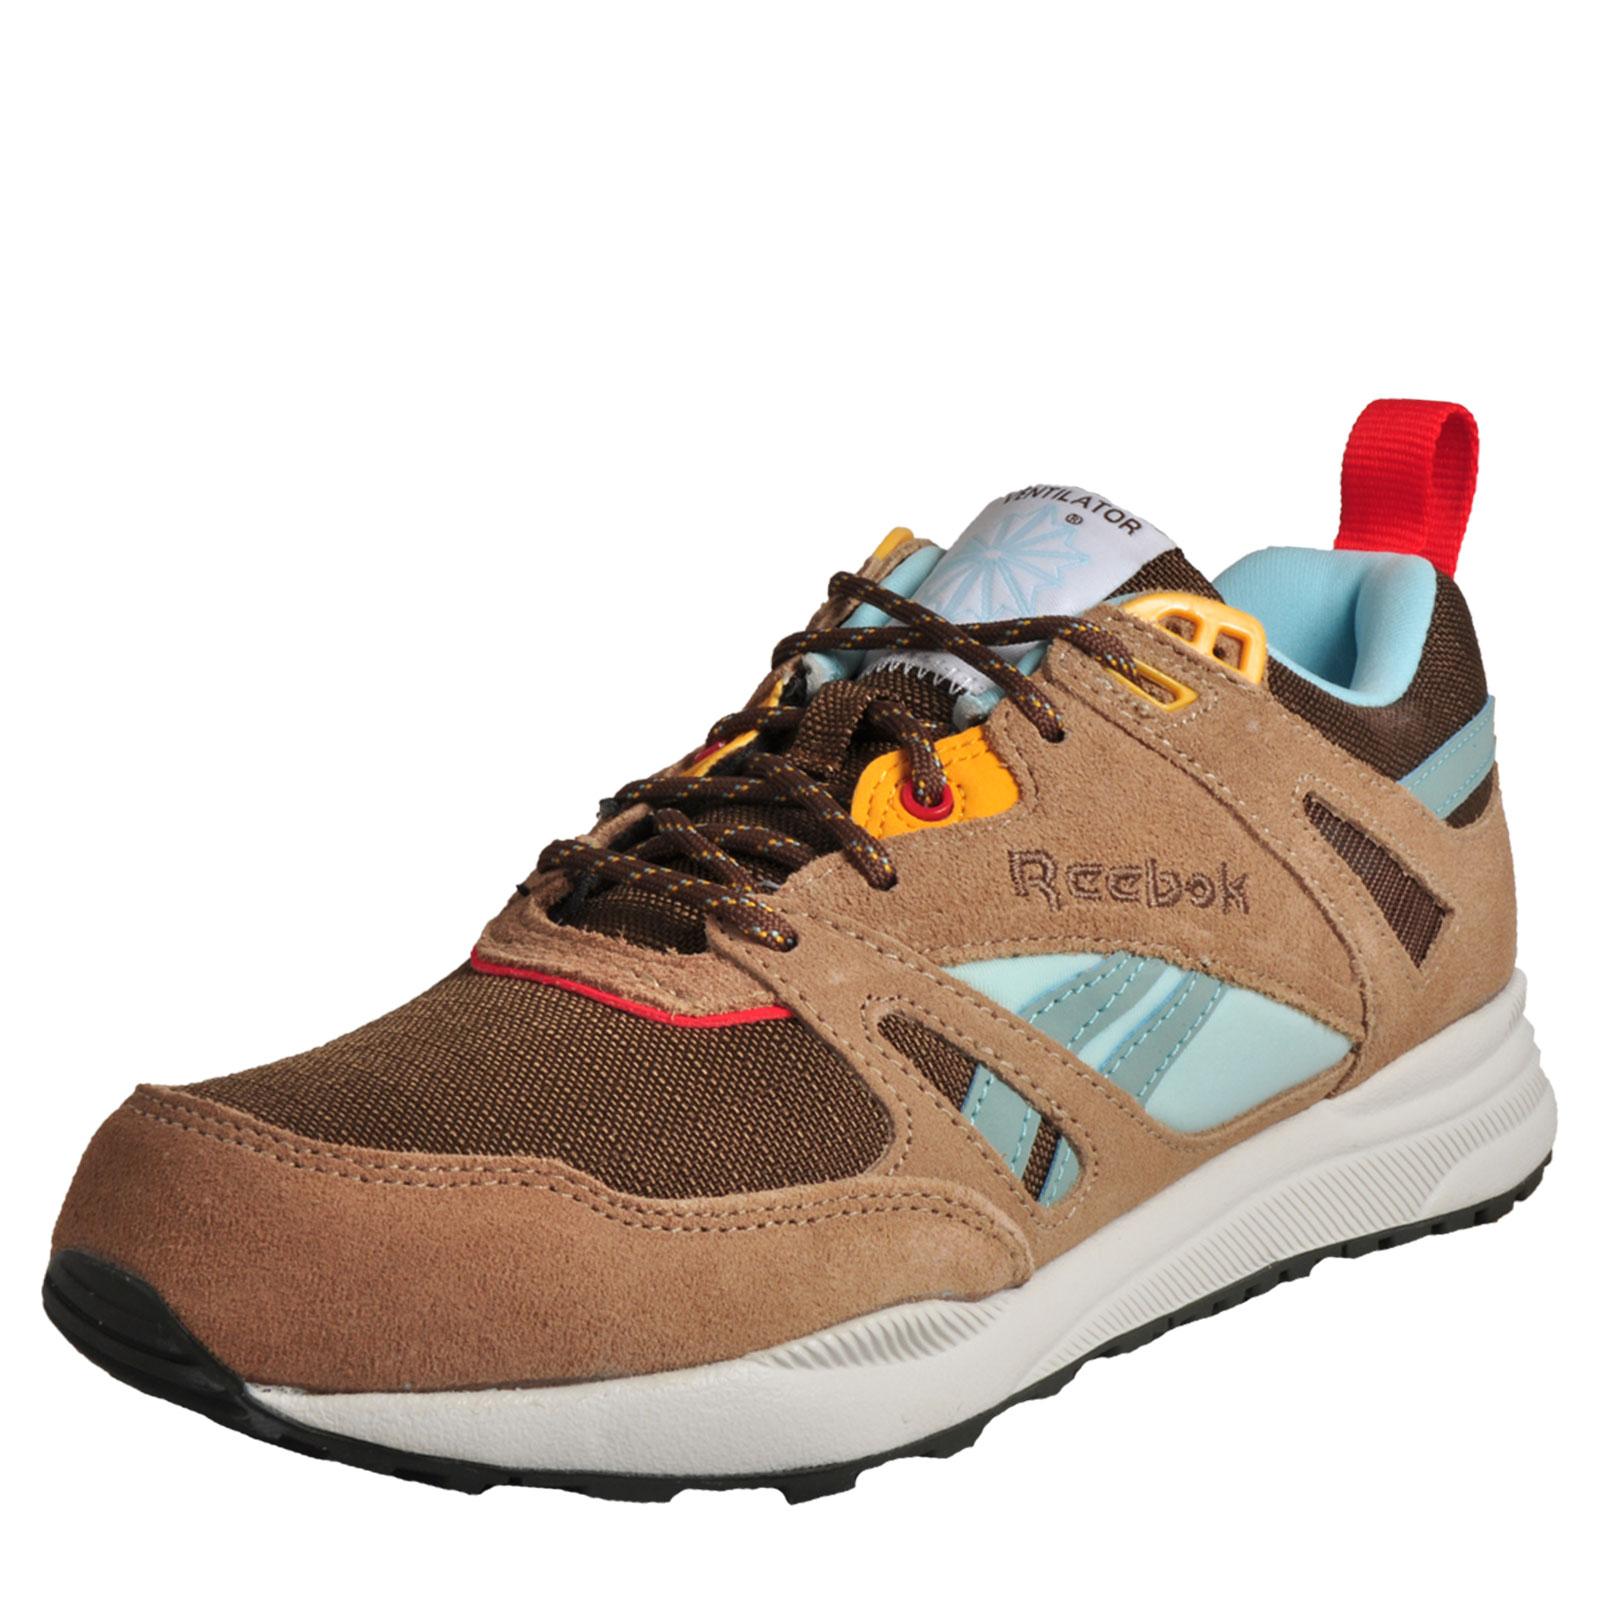 40580c6a8bfc48 Details zu Reebok Hexalite Ventilator SO Womens Casual Classic Retro  Running Shoes Trainers